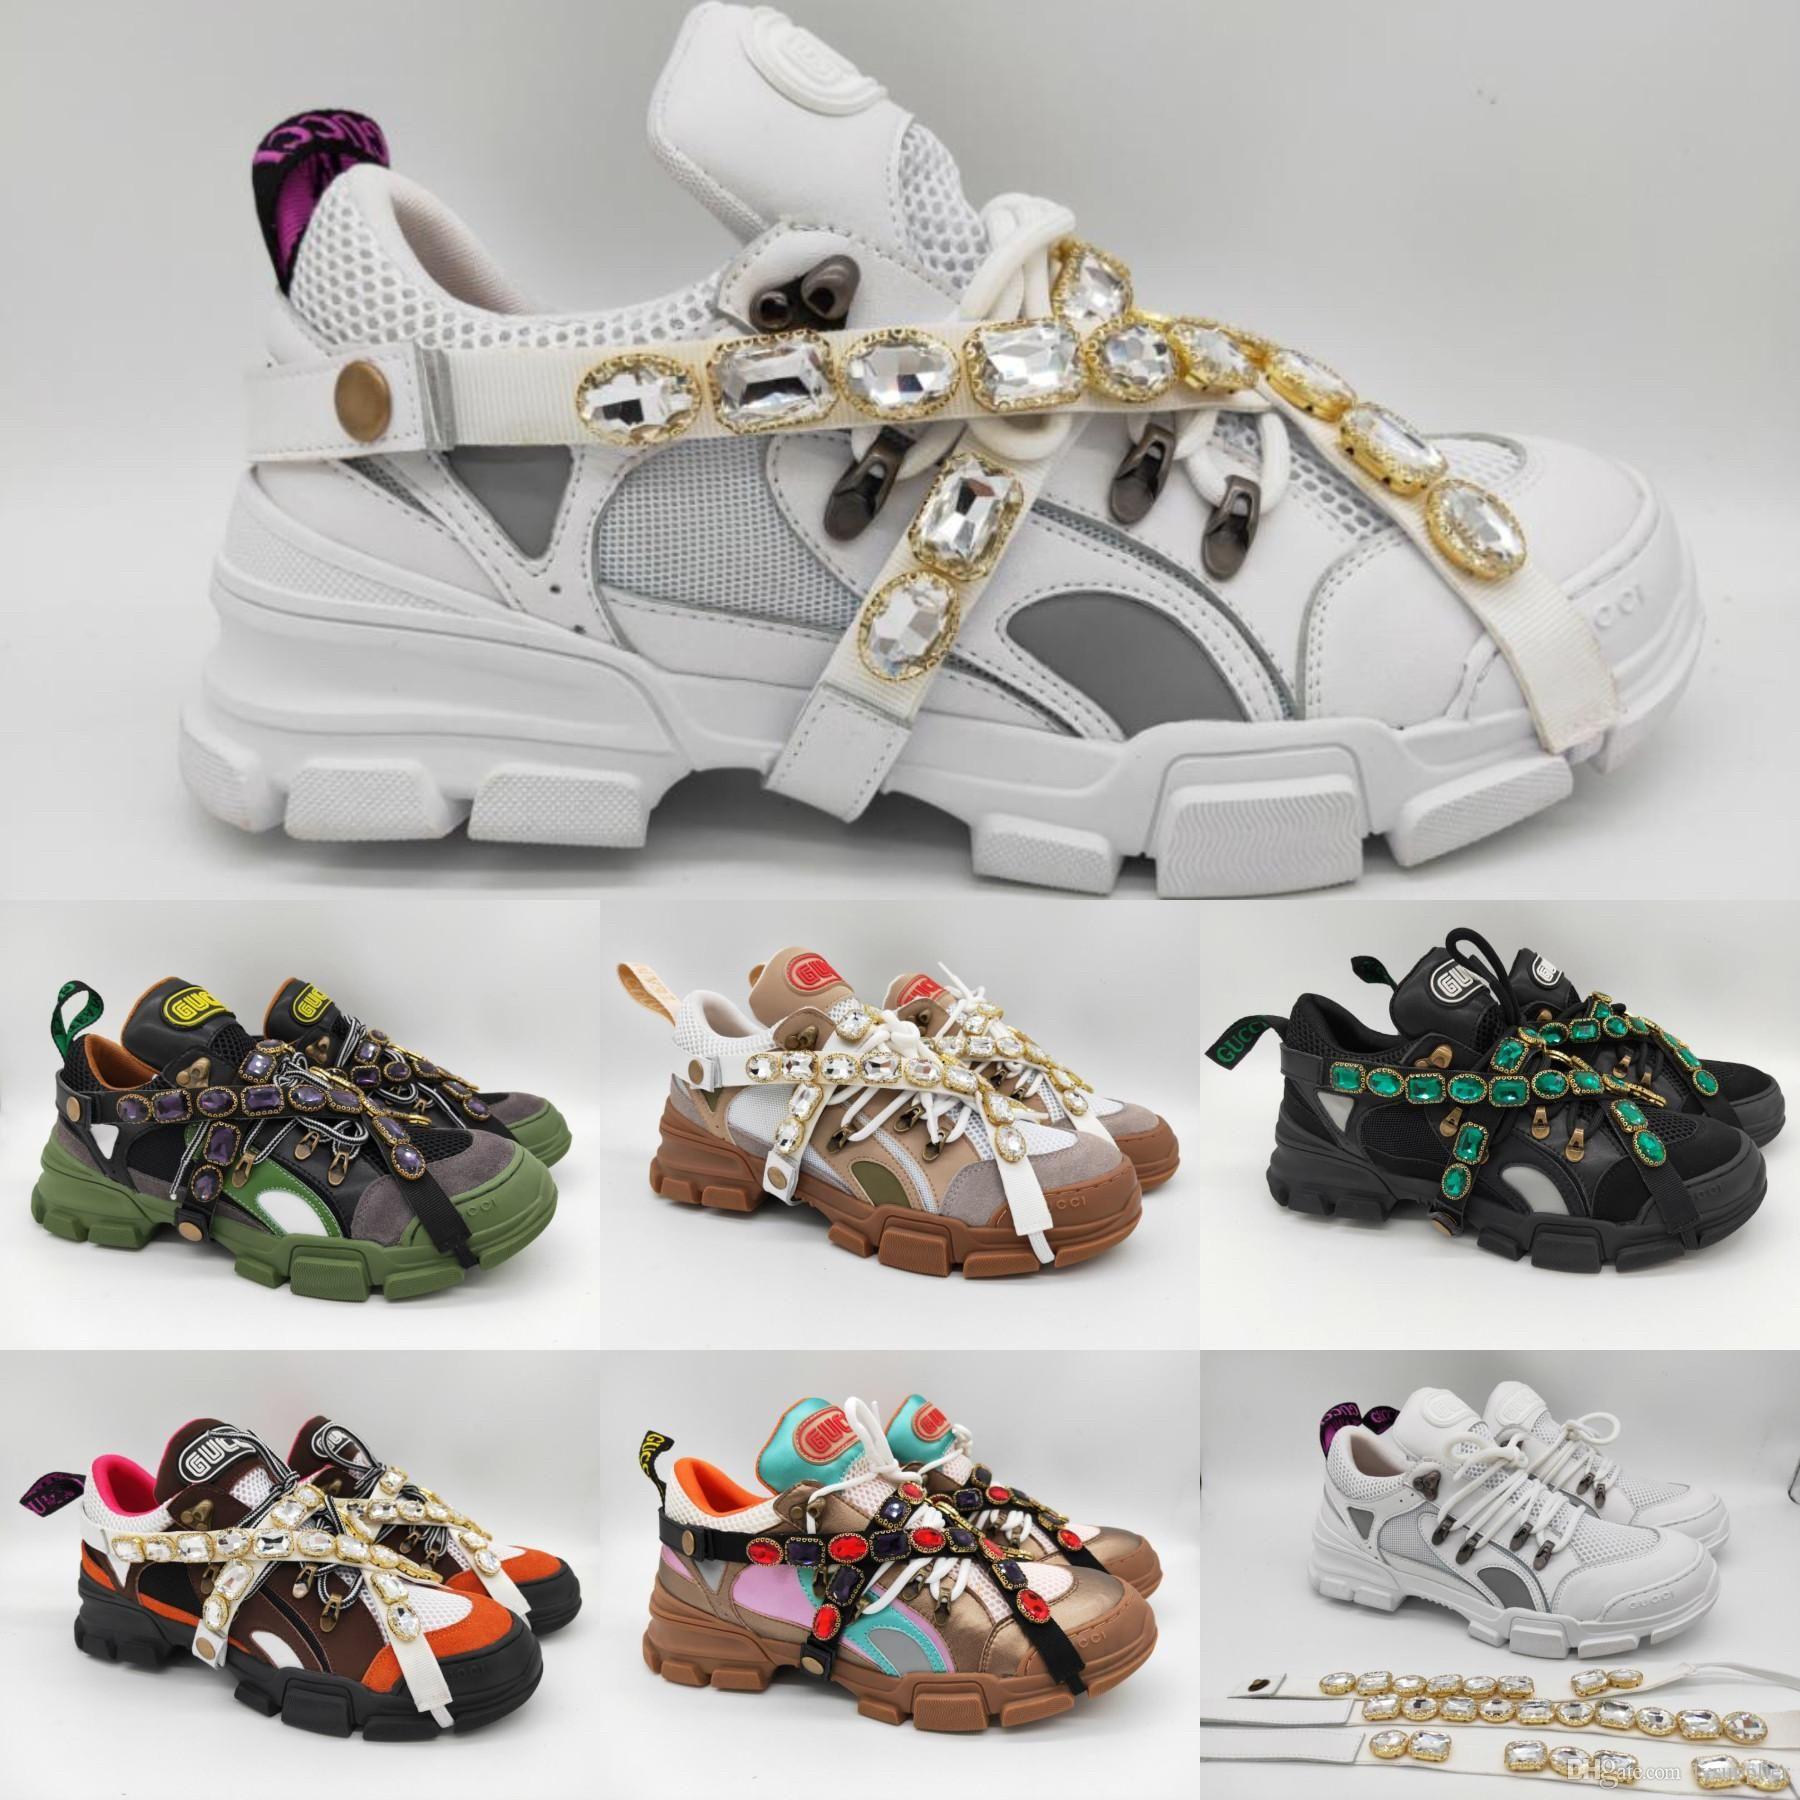 Flashtrek Box Womens Brand Abnehmbaren Schuhe Bergsteigen Kristallen Sneaker Outdoor Wanderschuhe Mit Designer Luxury Sneakers Mens QdWxerBECo